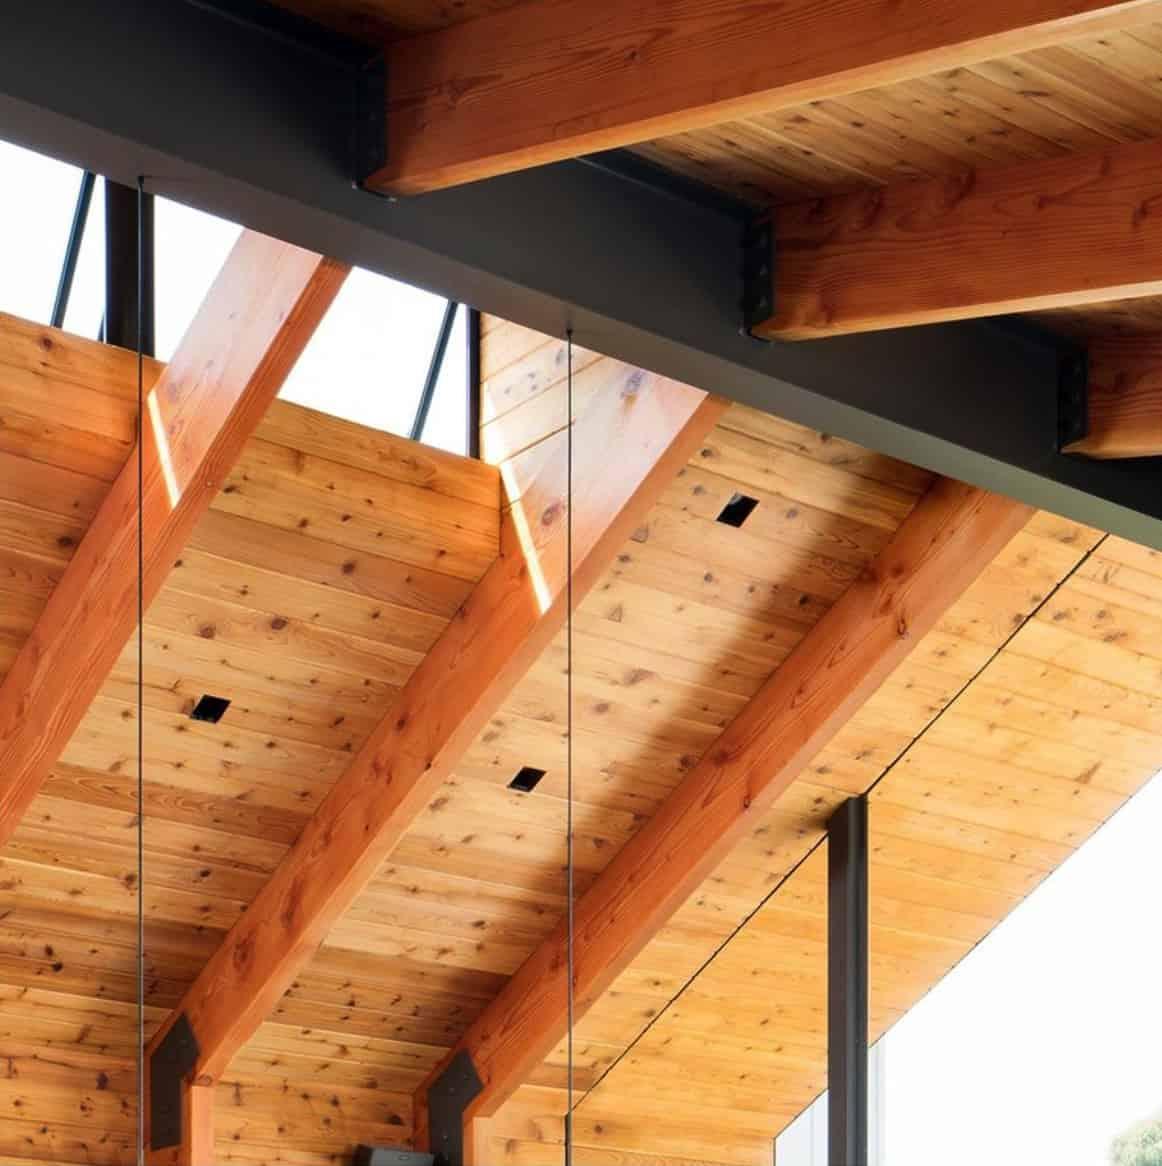 art-barn-ceiling-detail-with-skylight